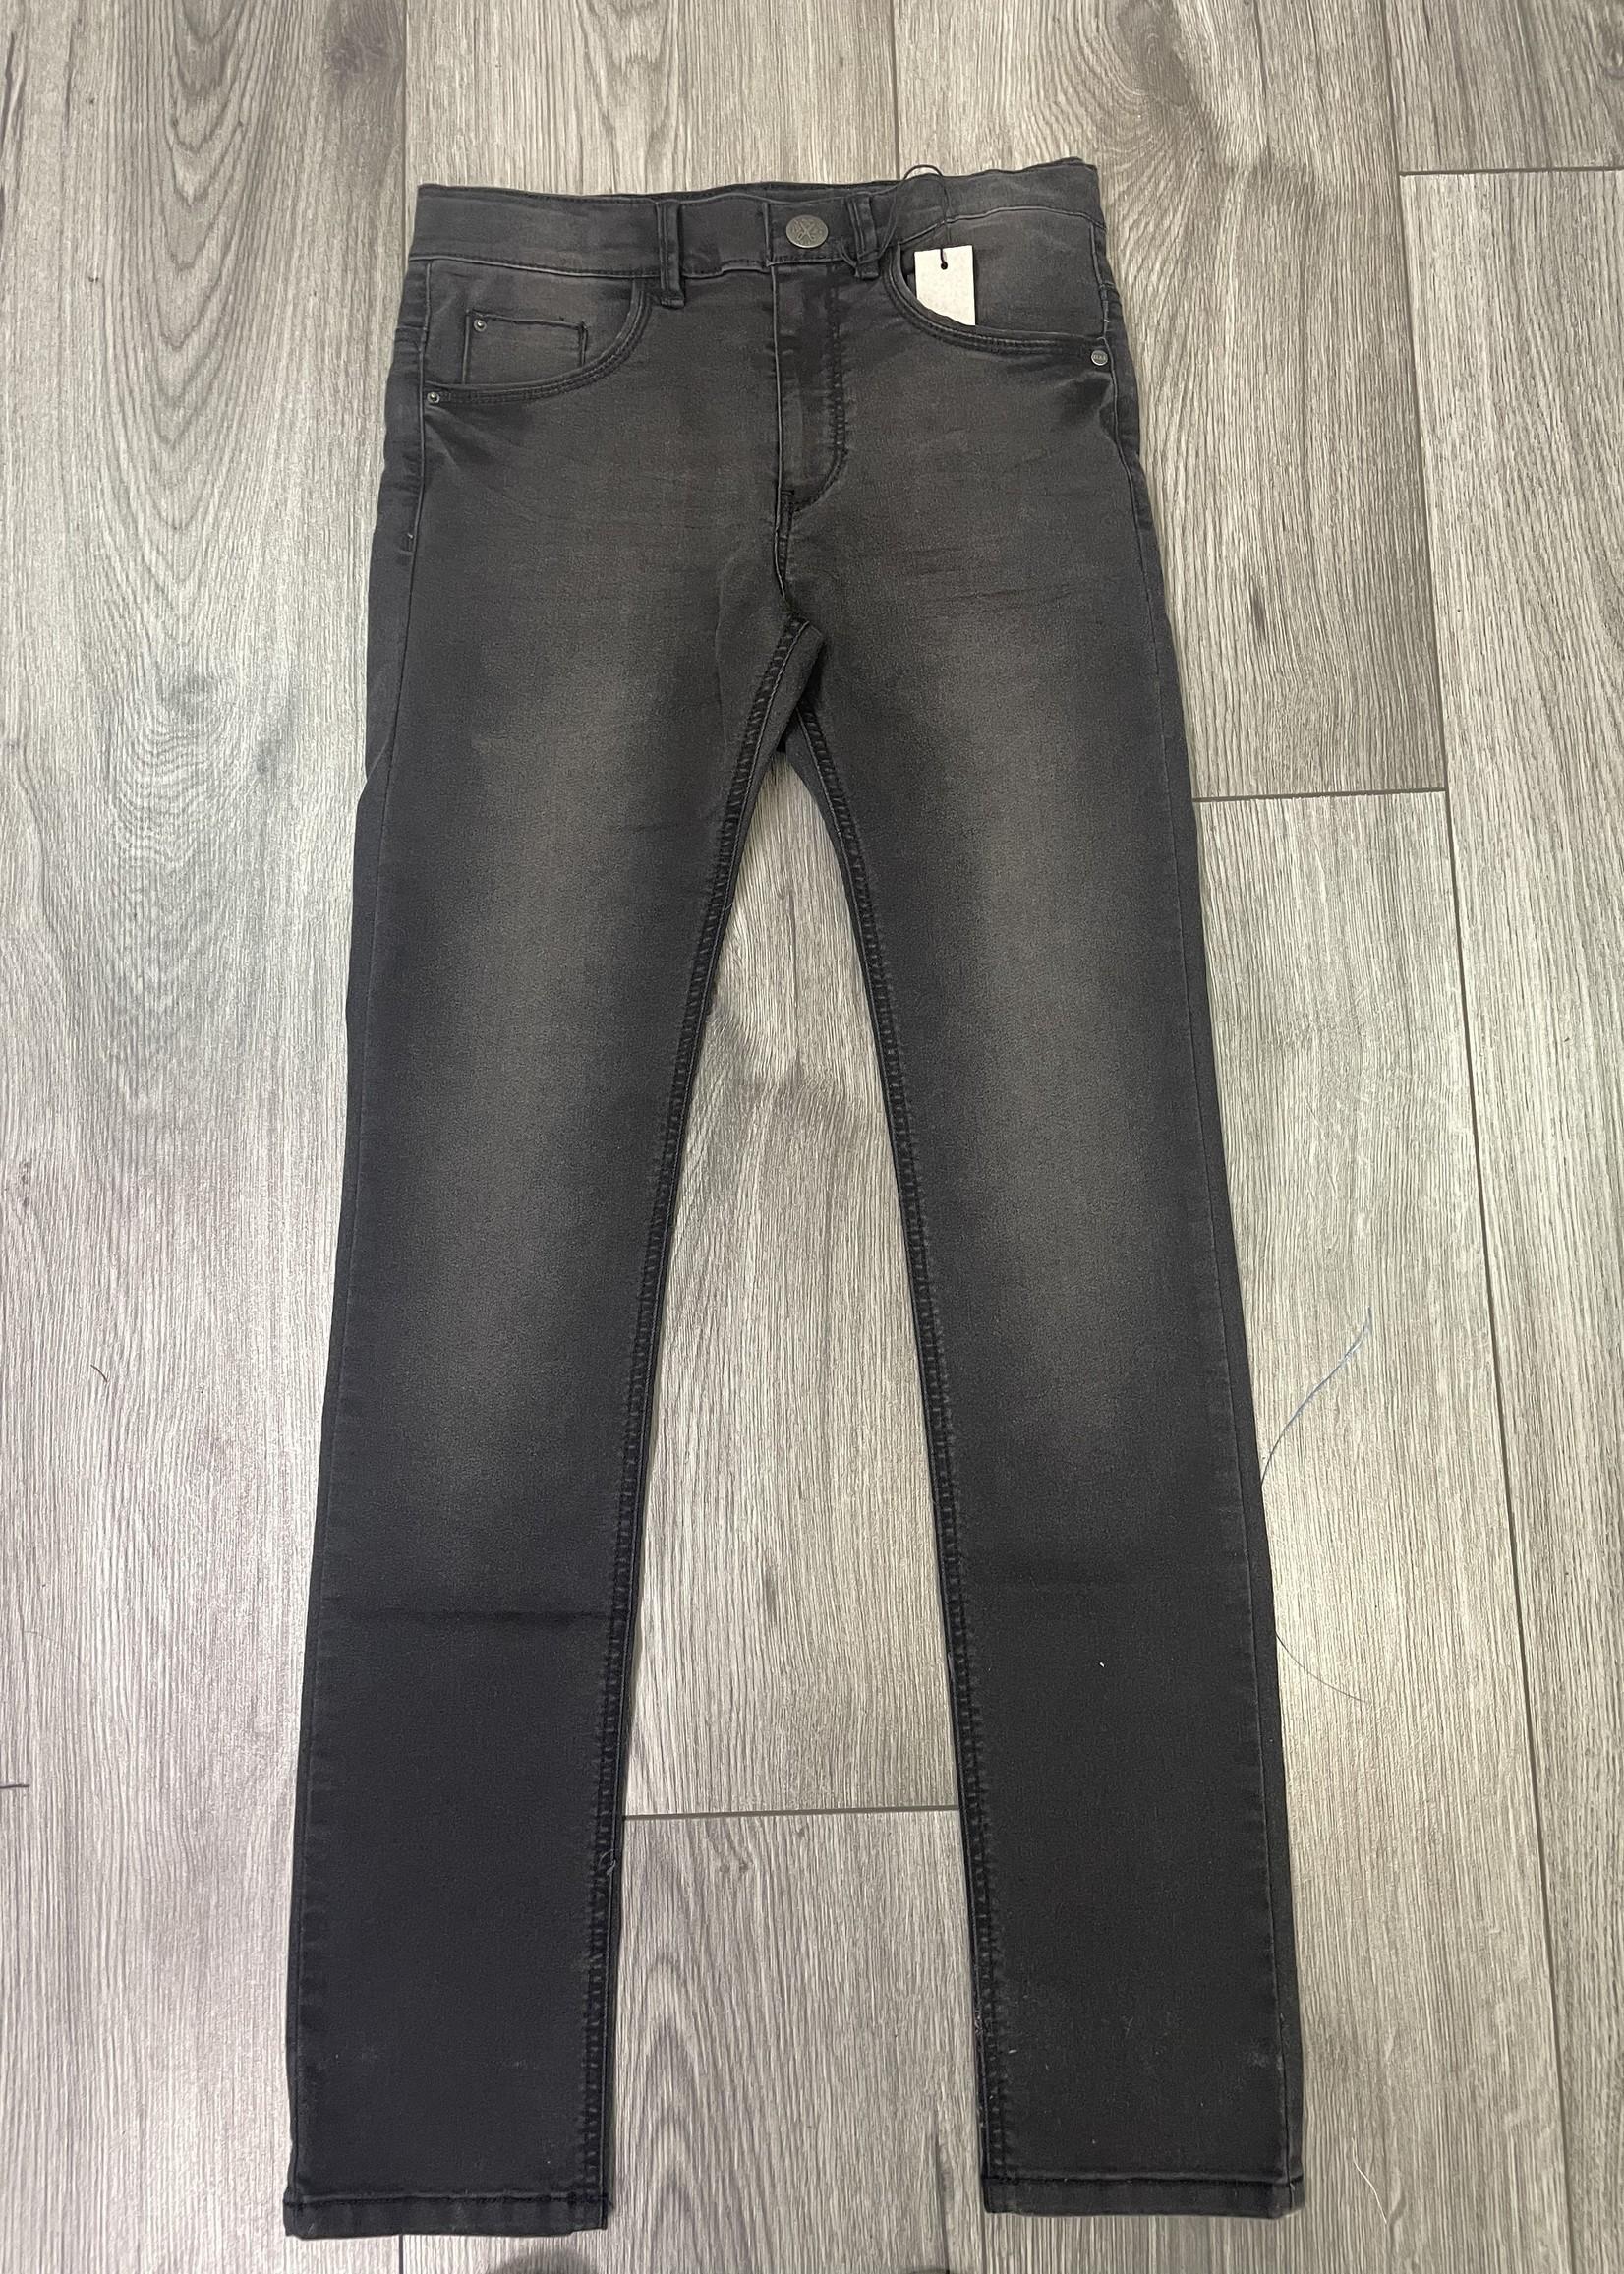 IKKS IKKS cityblack jeans